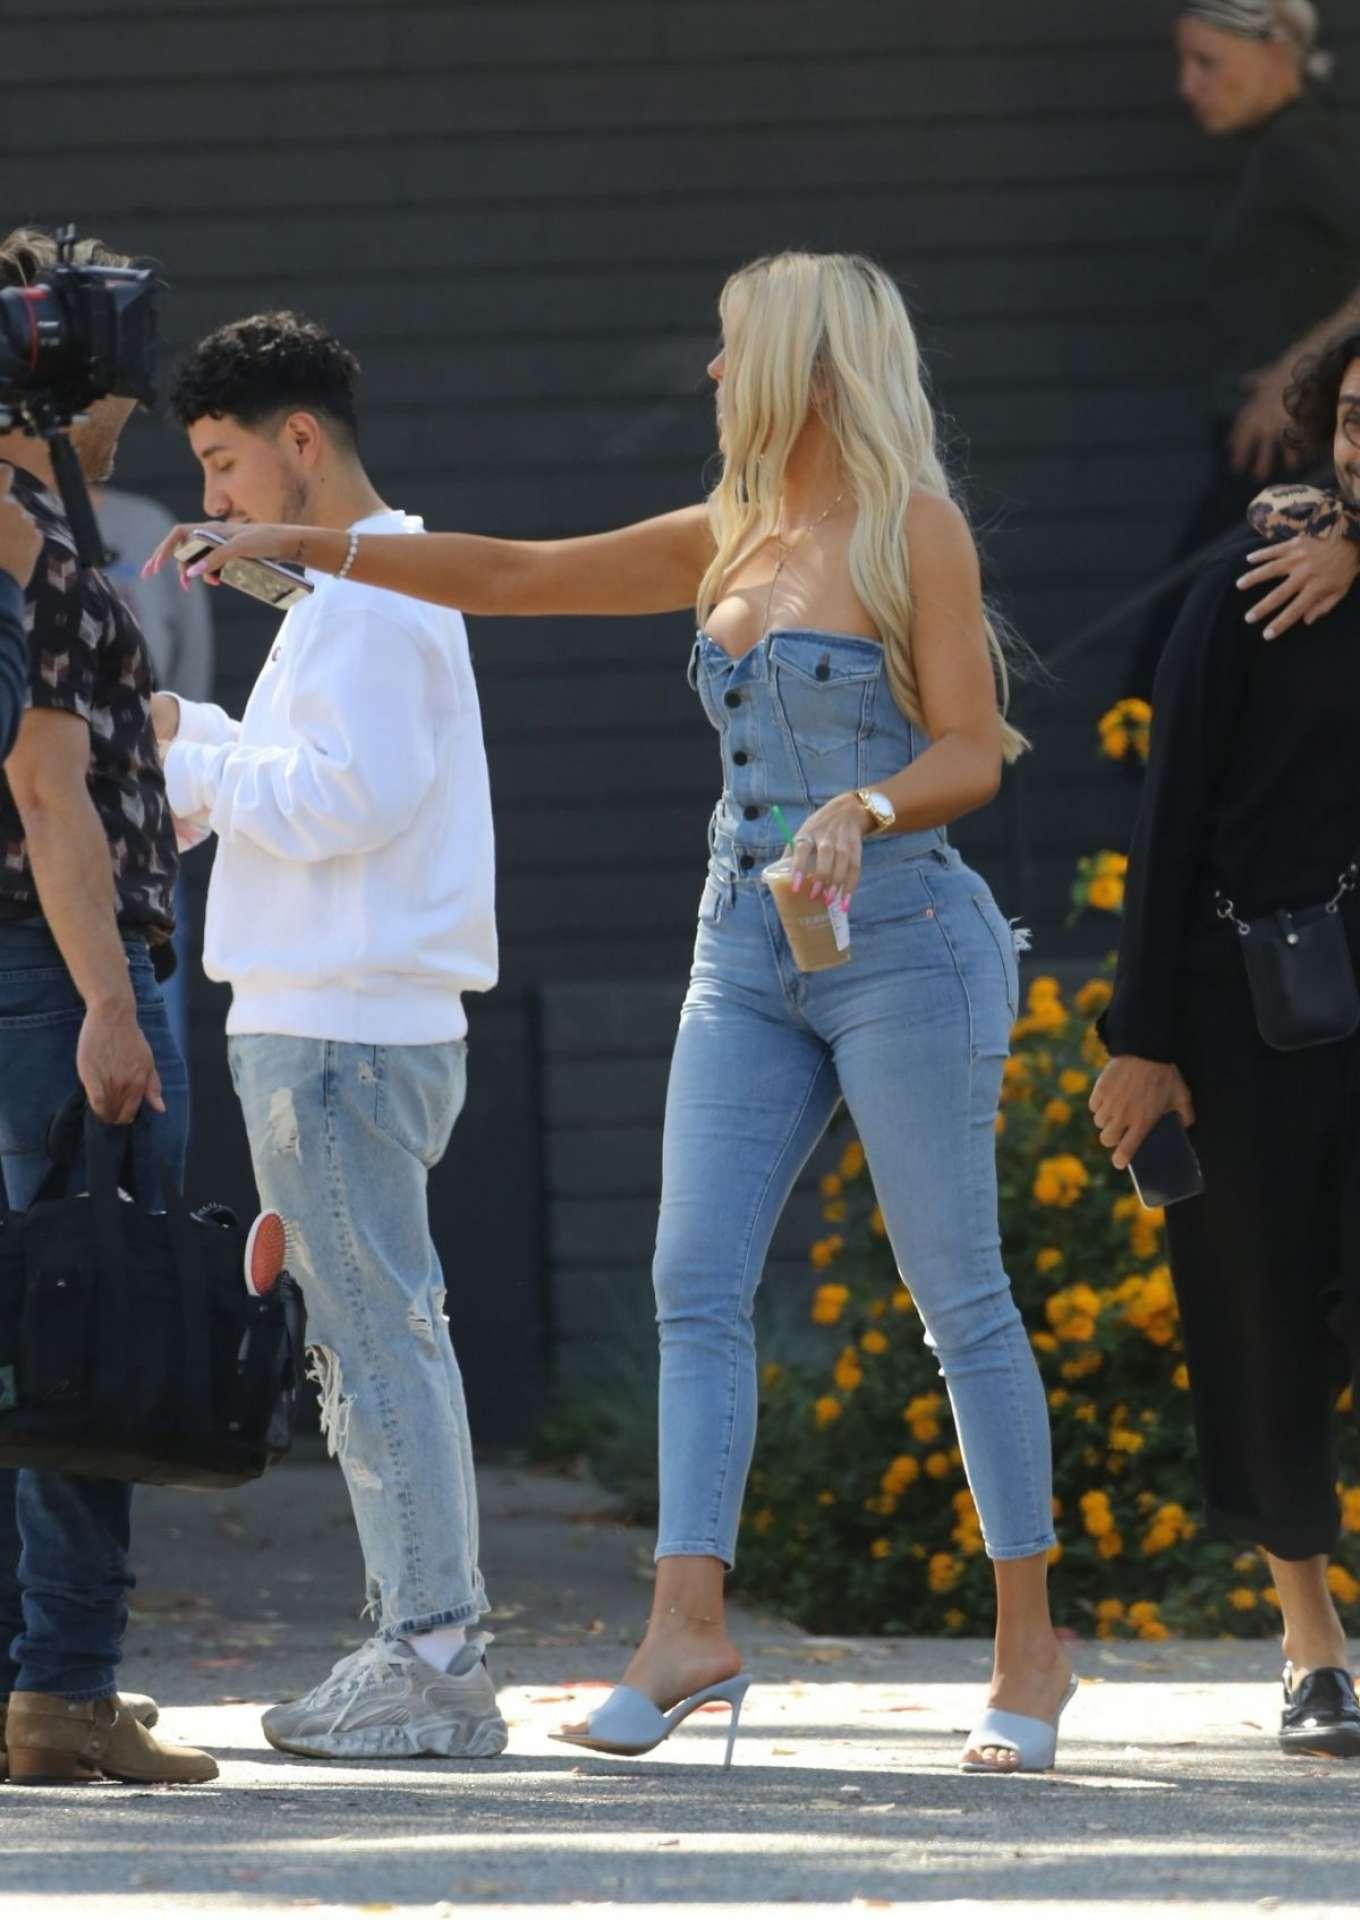 Khloe Kardashian in jeans arrives at a Studio in Los Angeles